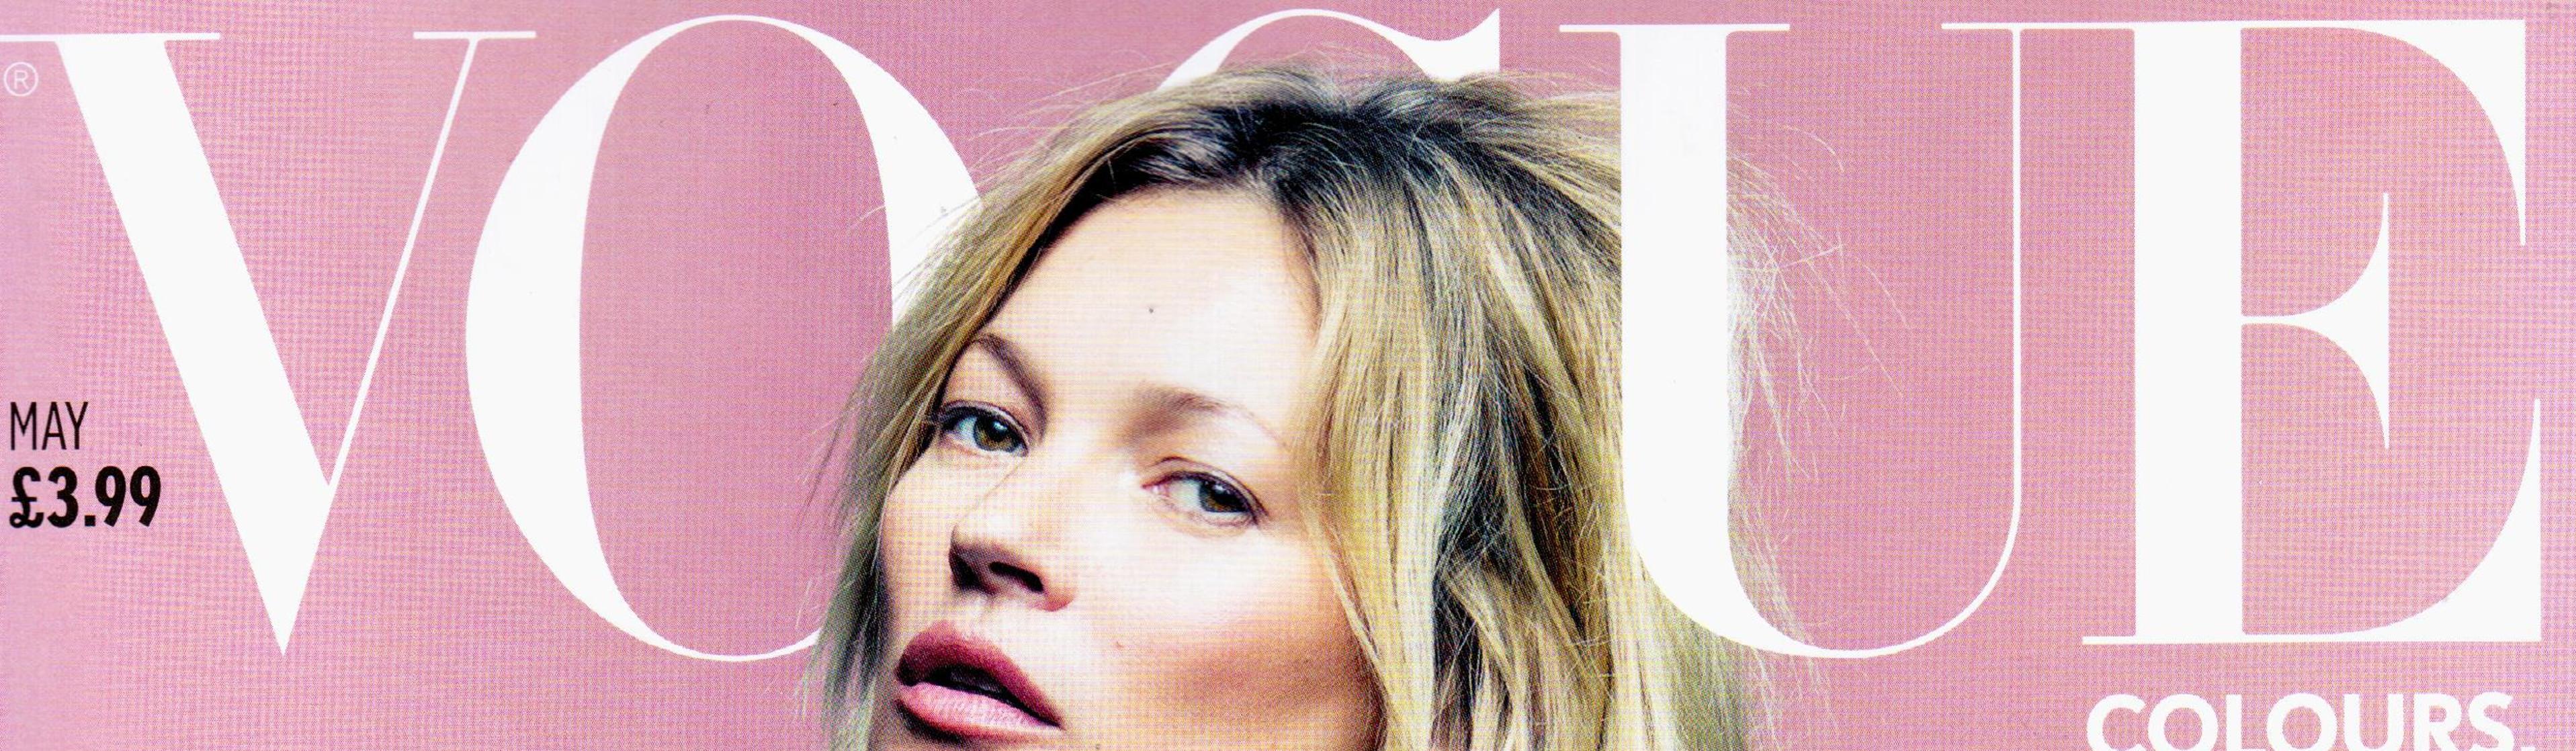 Alexandra Shulman Stepping Down as Editor of British Vogue